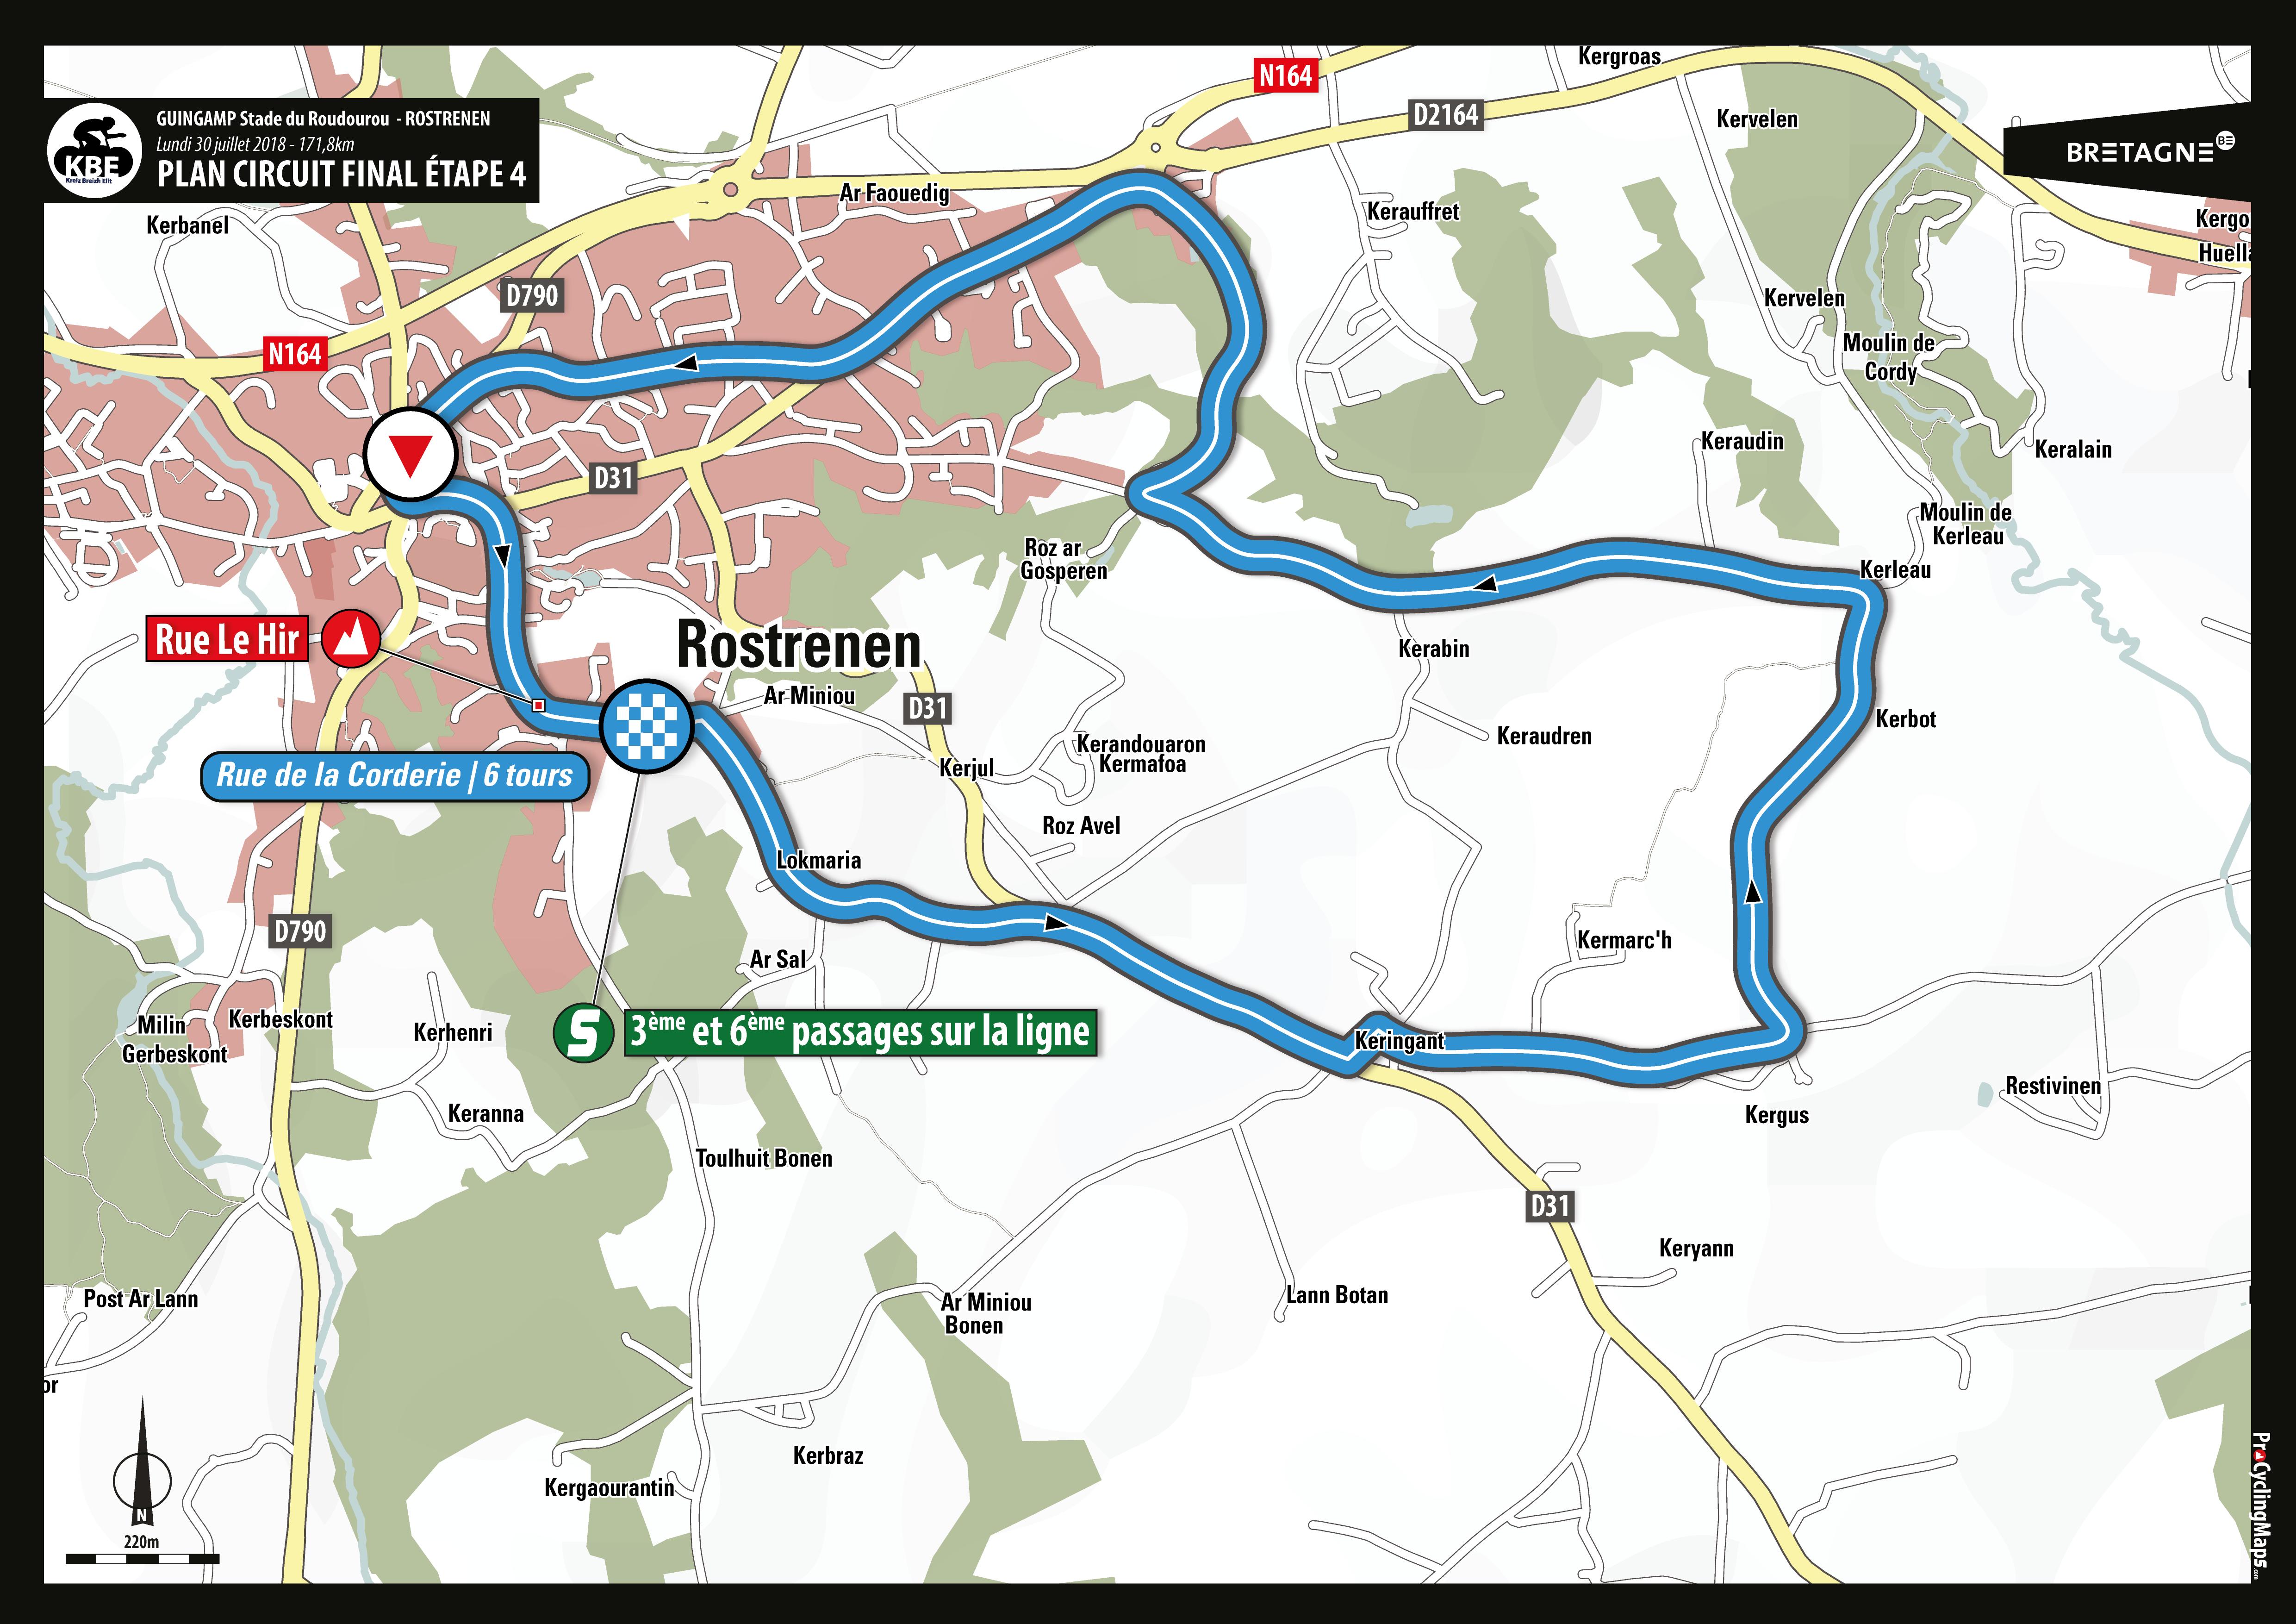 KBE2018 - Plan arrivée circuit final E4 - Rostrenen